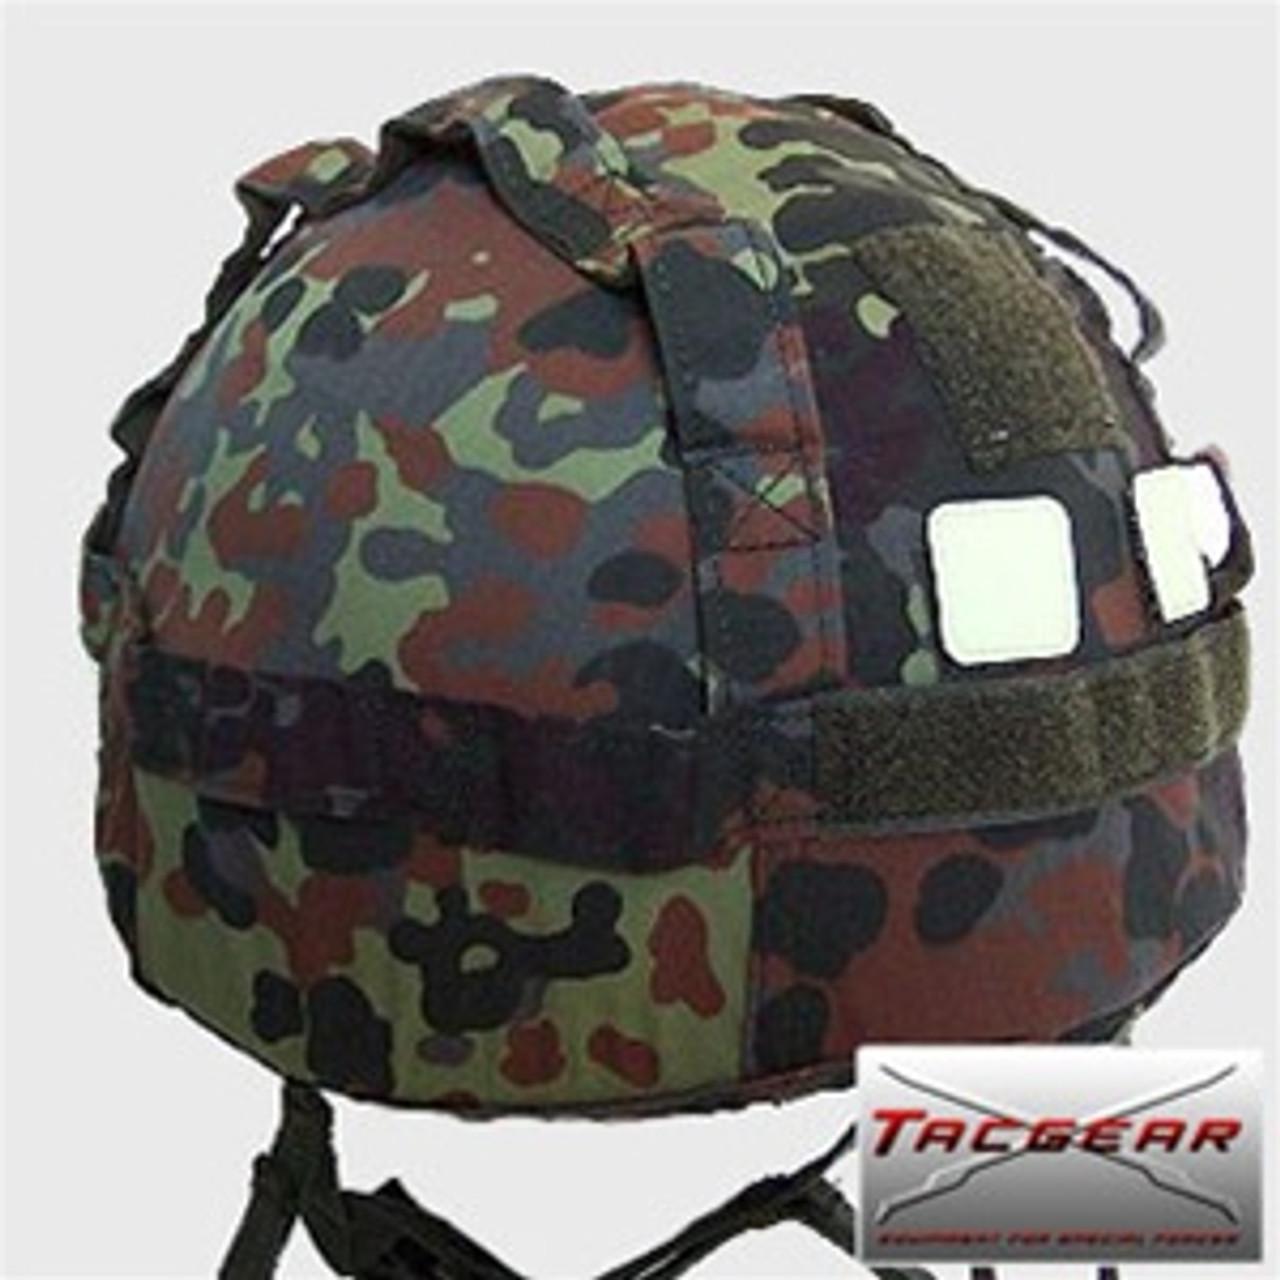 Improved Helmet Cover from Hessen Antique